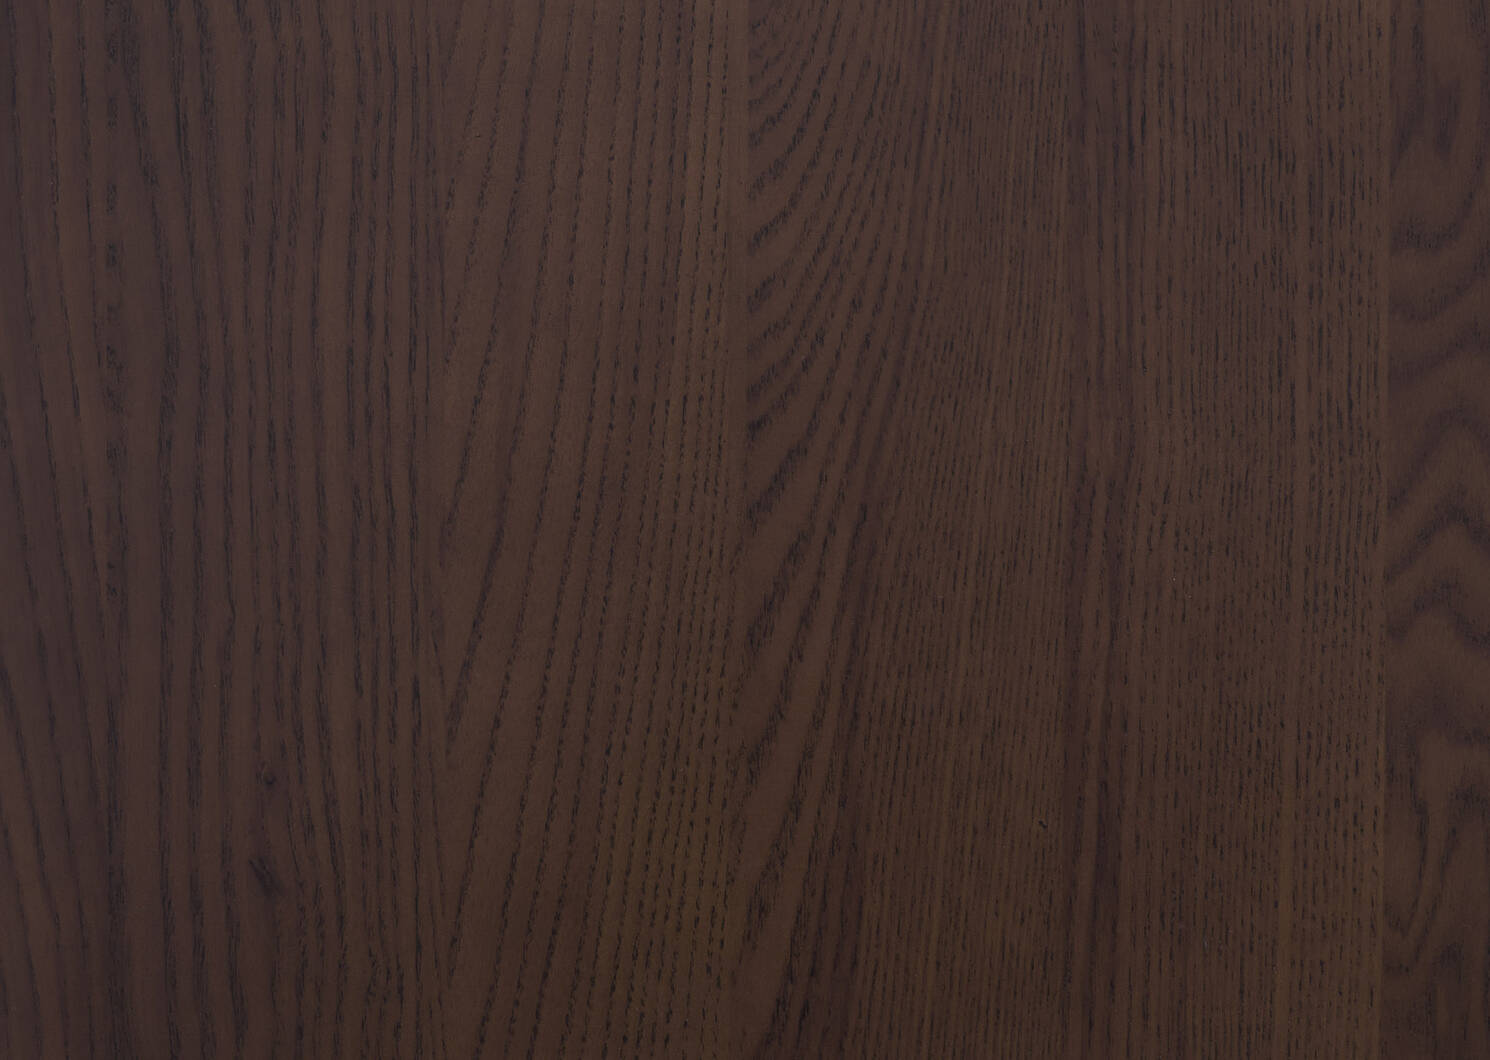 Nolin Counter Stool -Brown Ash